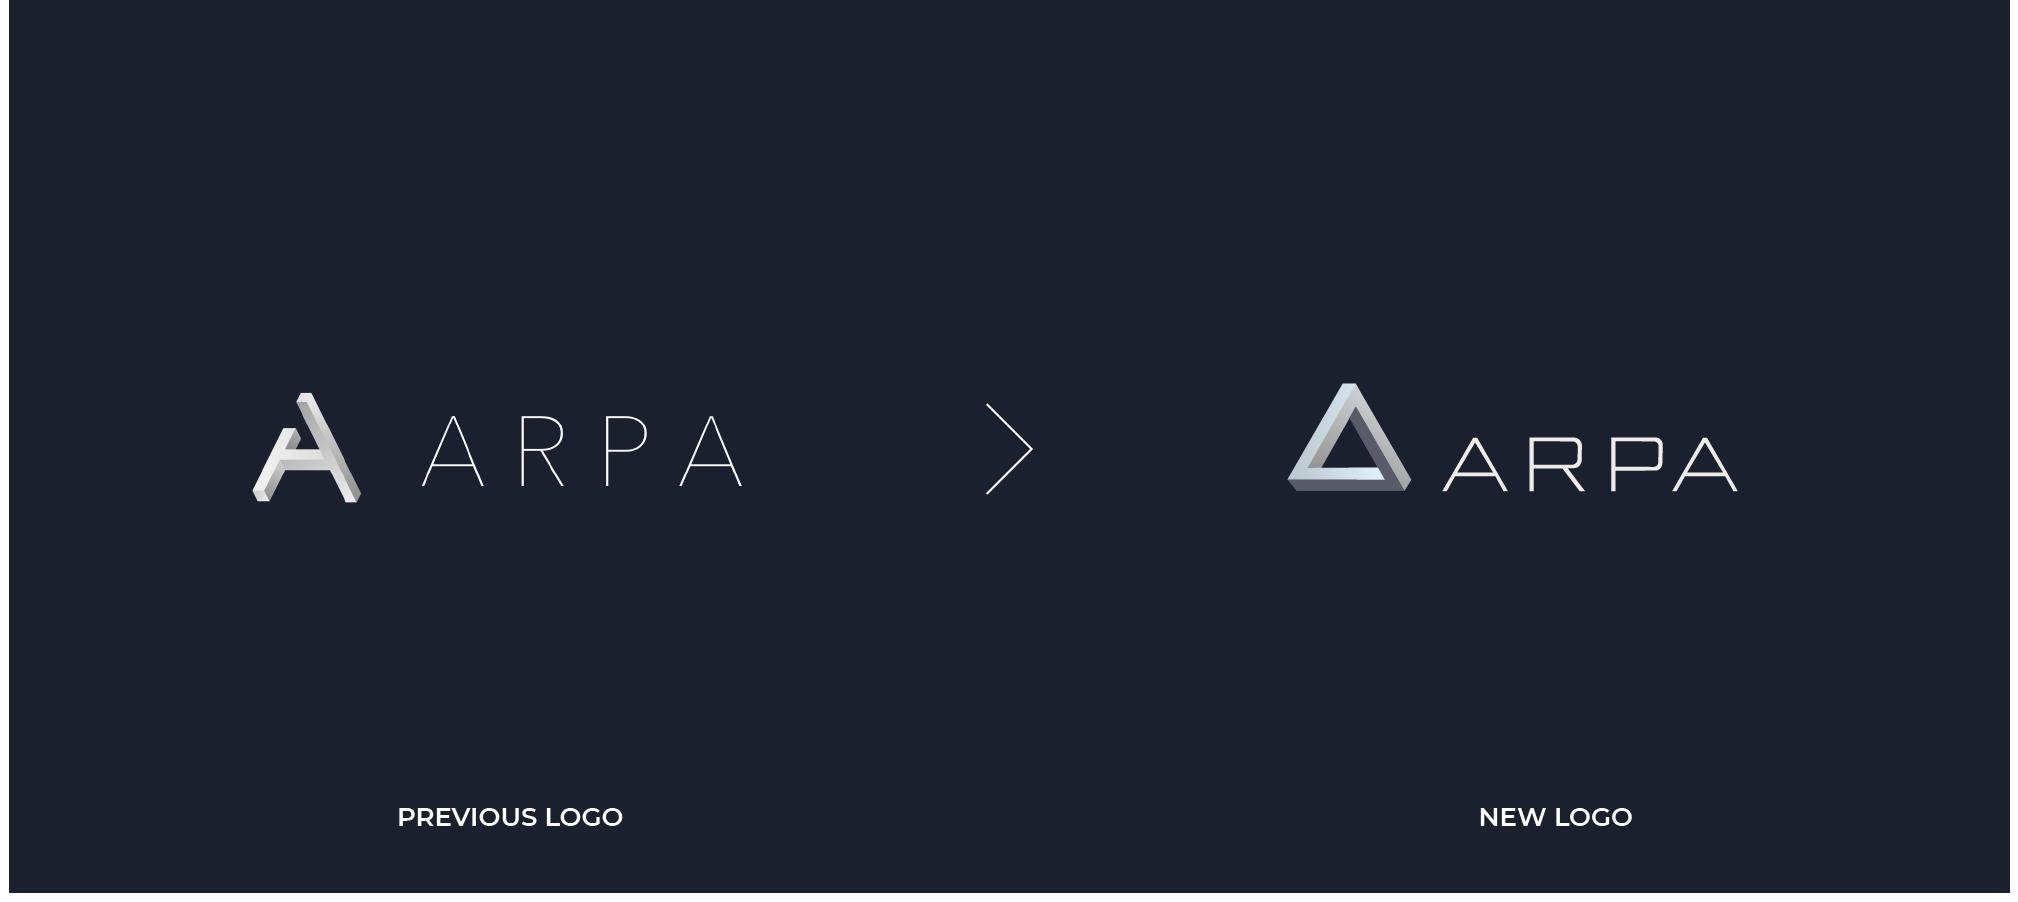 ARPA_workFile-Previous-rebrand-36